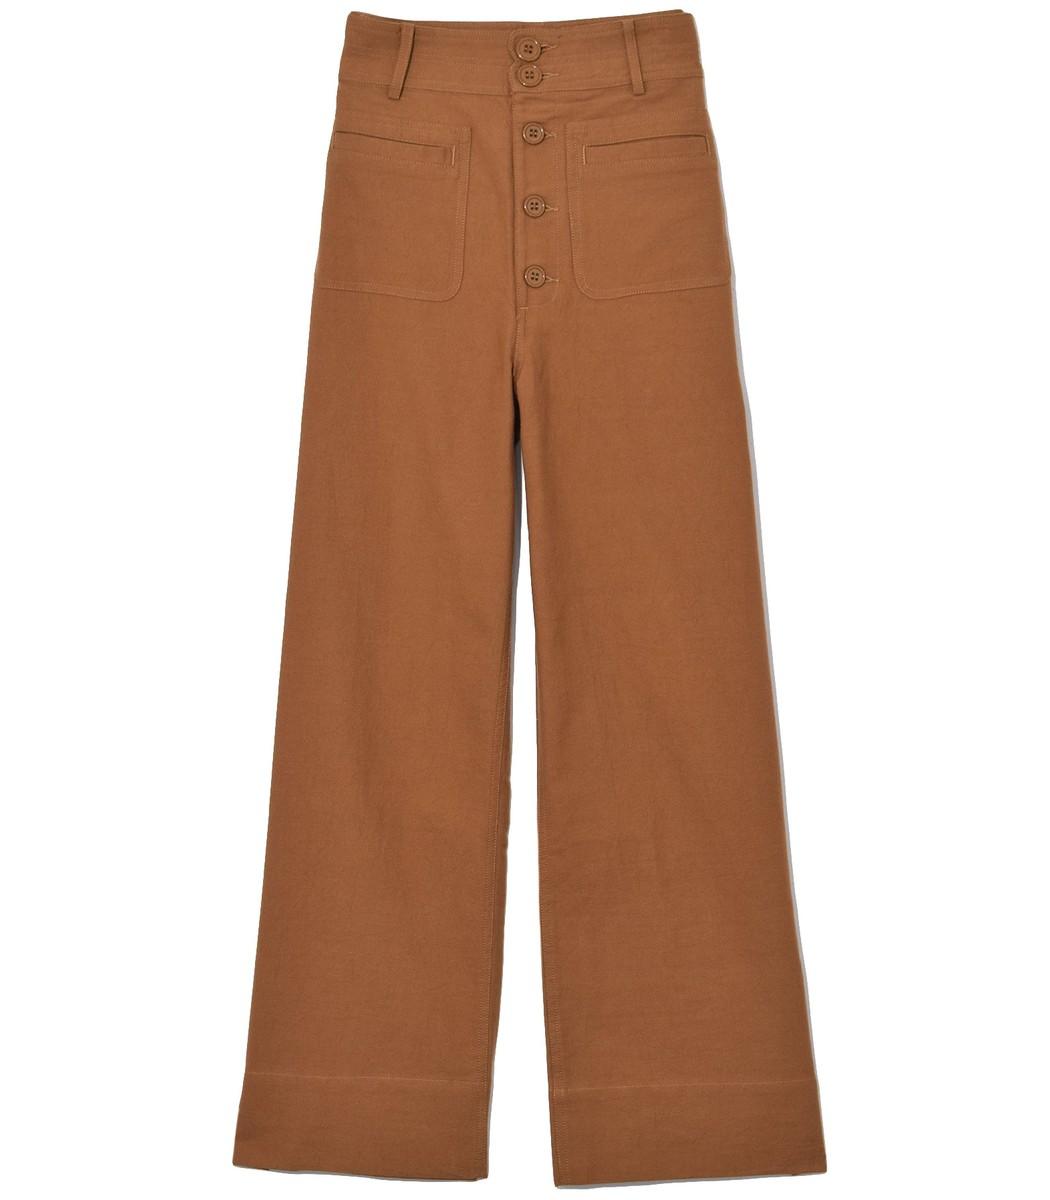 APIECE APART Marston Pant in Cinnamon